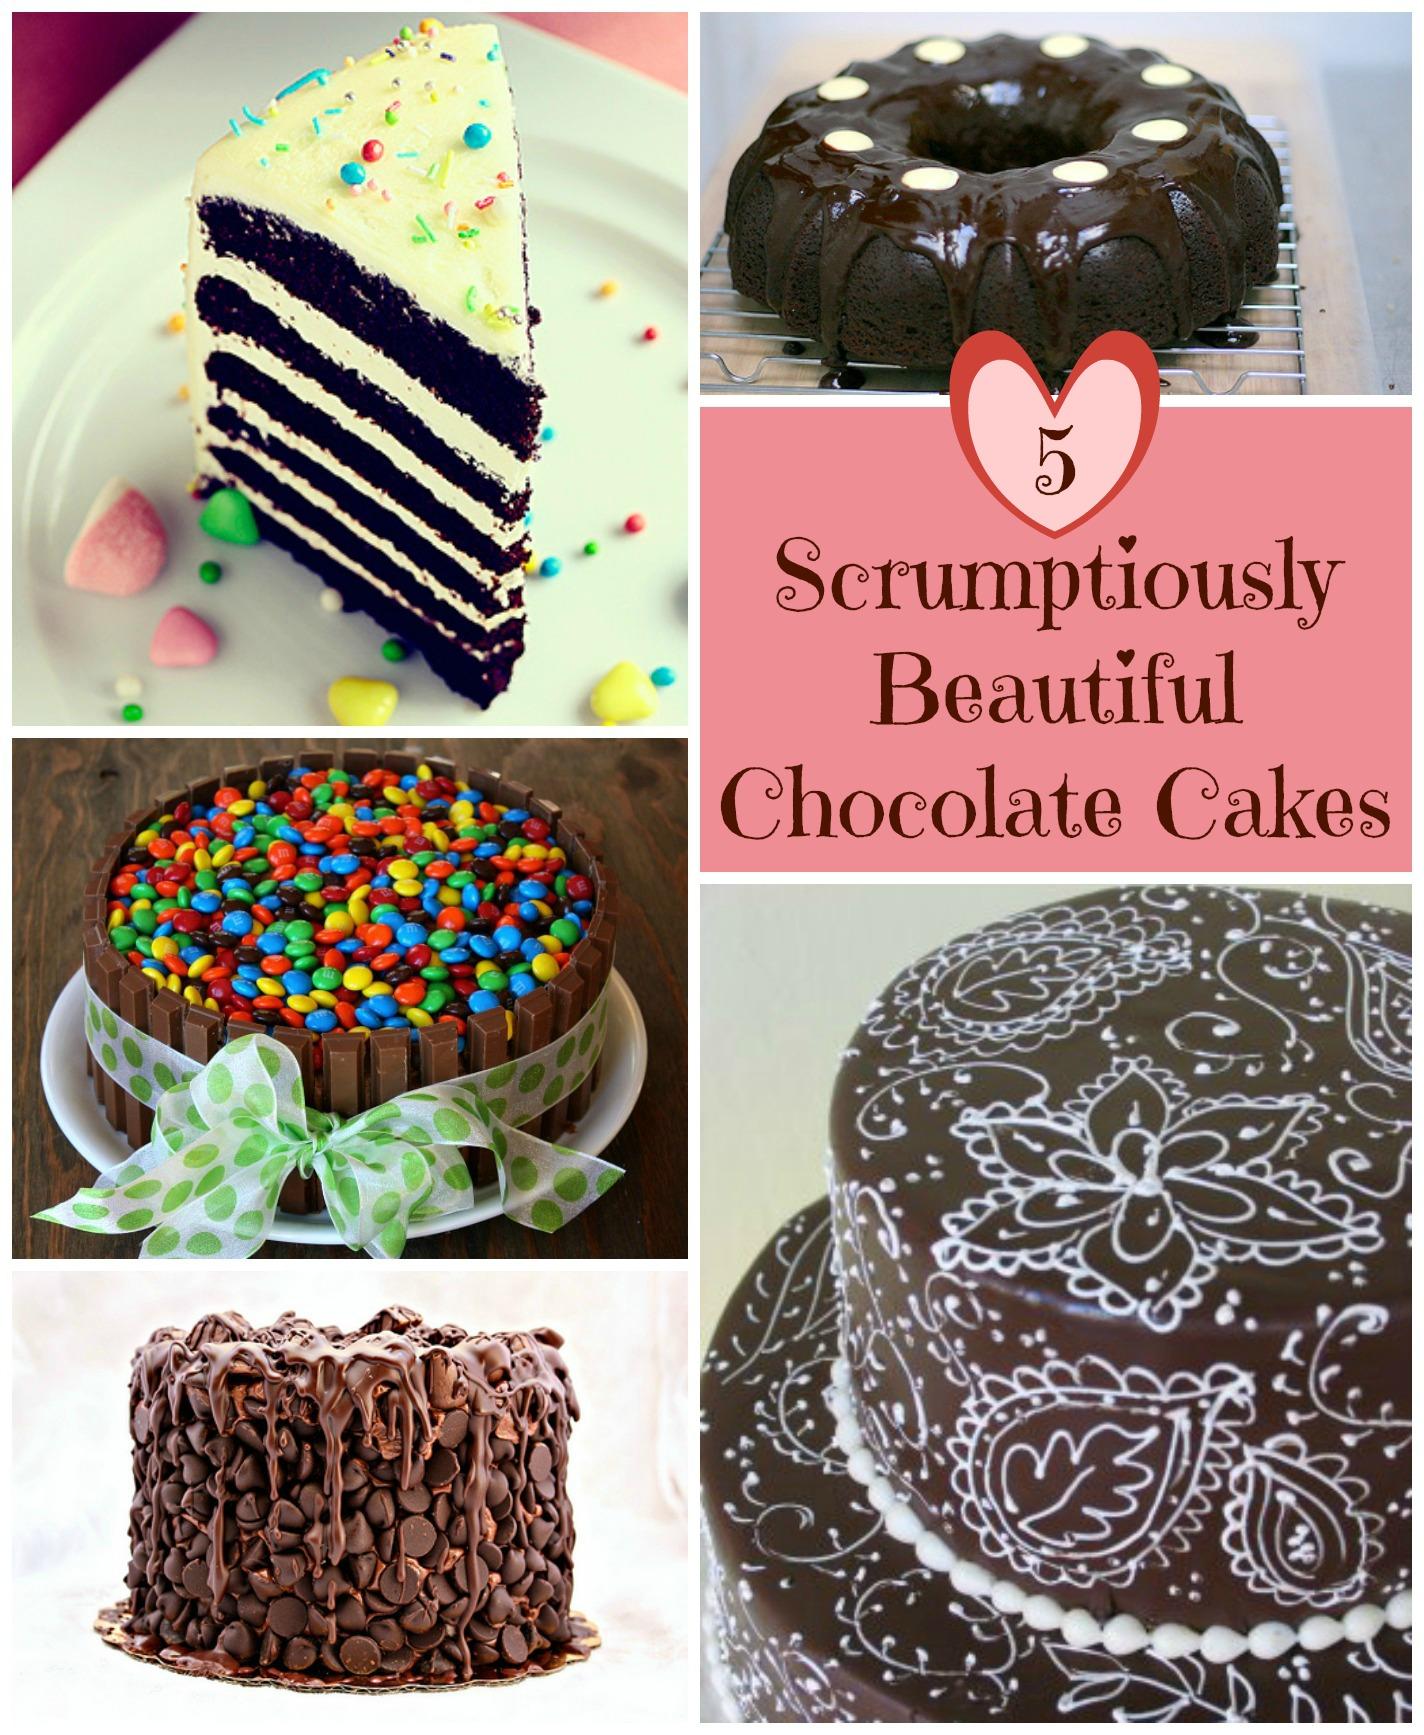 5 Scrumptiously Beautiful Chocolate Cake Design Ideas